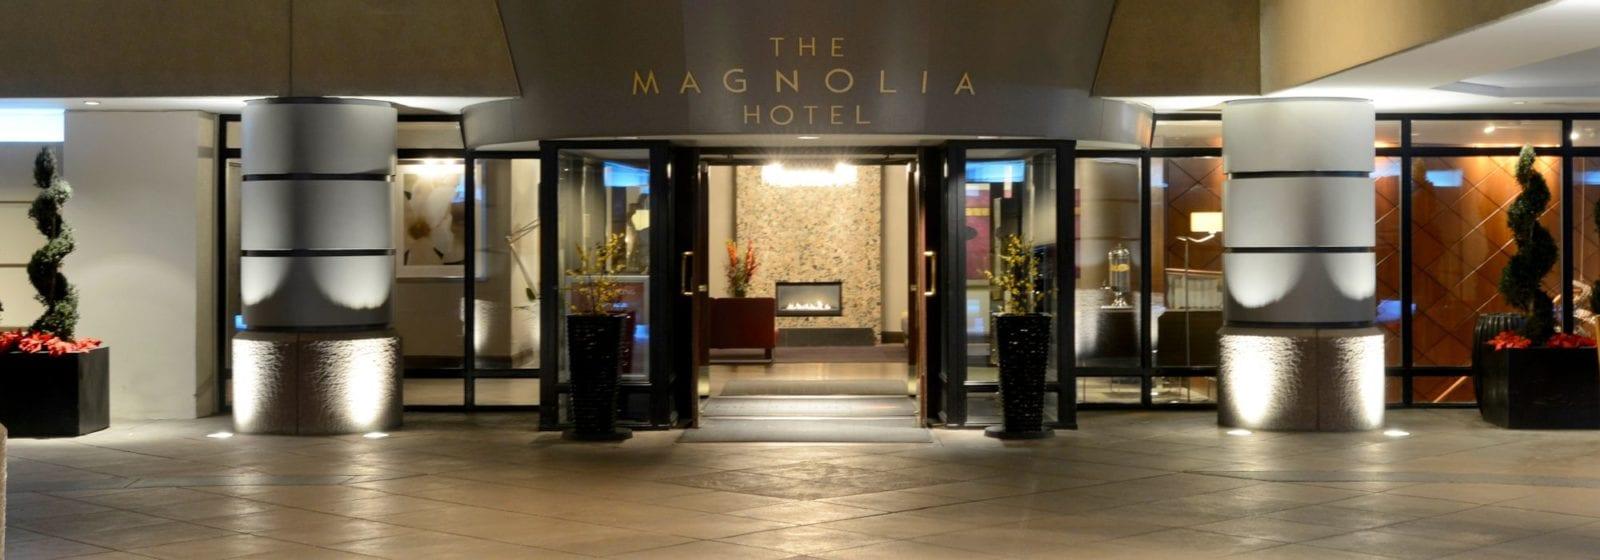 Magnolia Hotel Entrance Denver CO